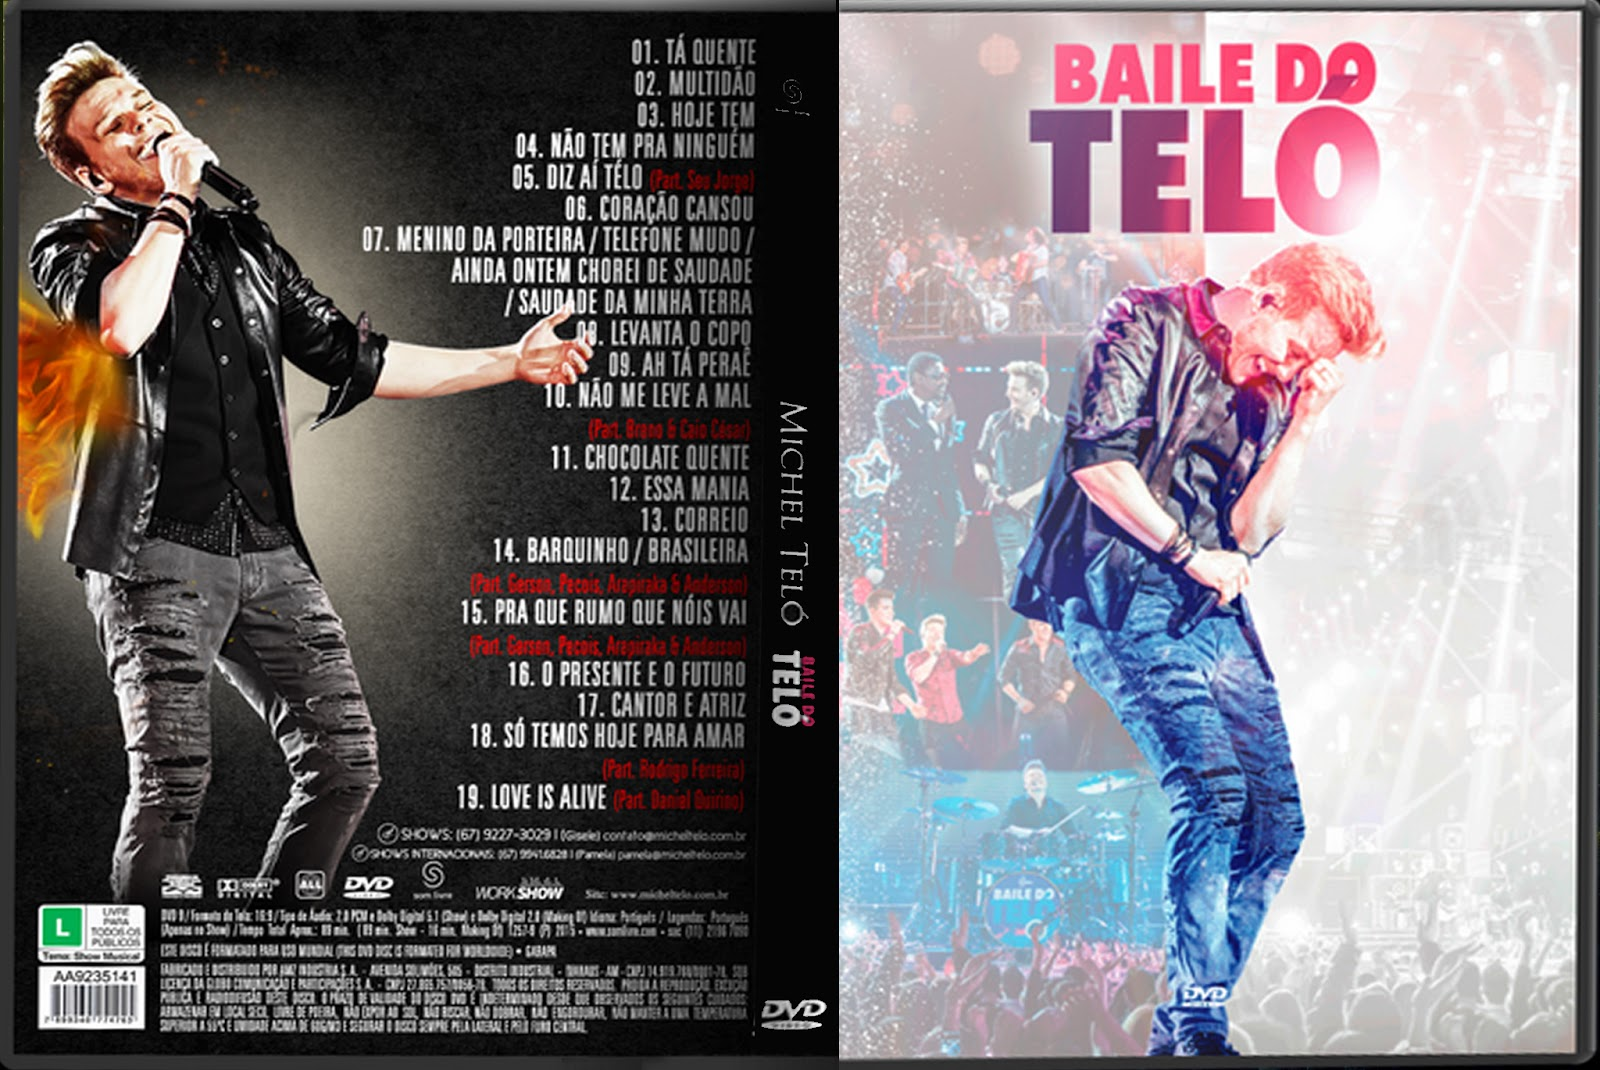 Download Michel Teló Baile do Teló BDRip XviD 2015 Michel 2BTel 25C3 25B3 2BBaile 2BDo 2BTel 25C3 25B3 2B 25282015 2529